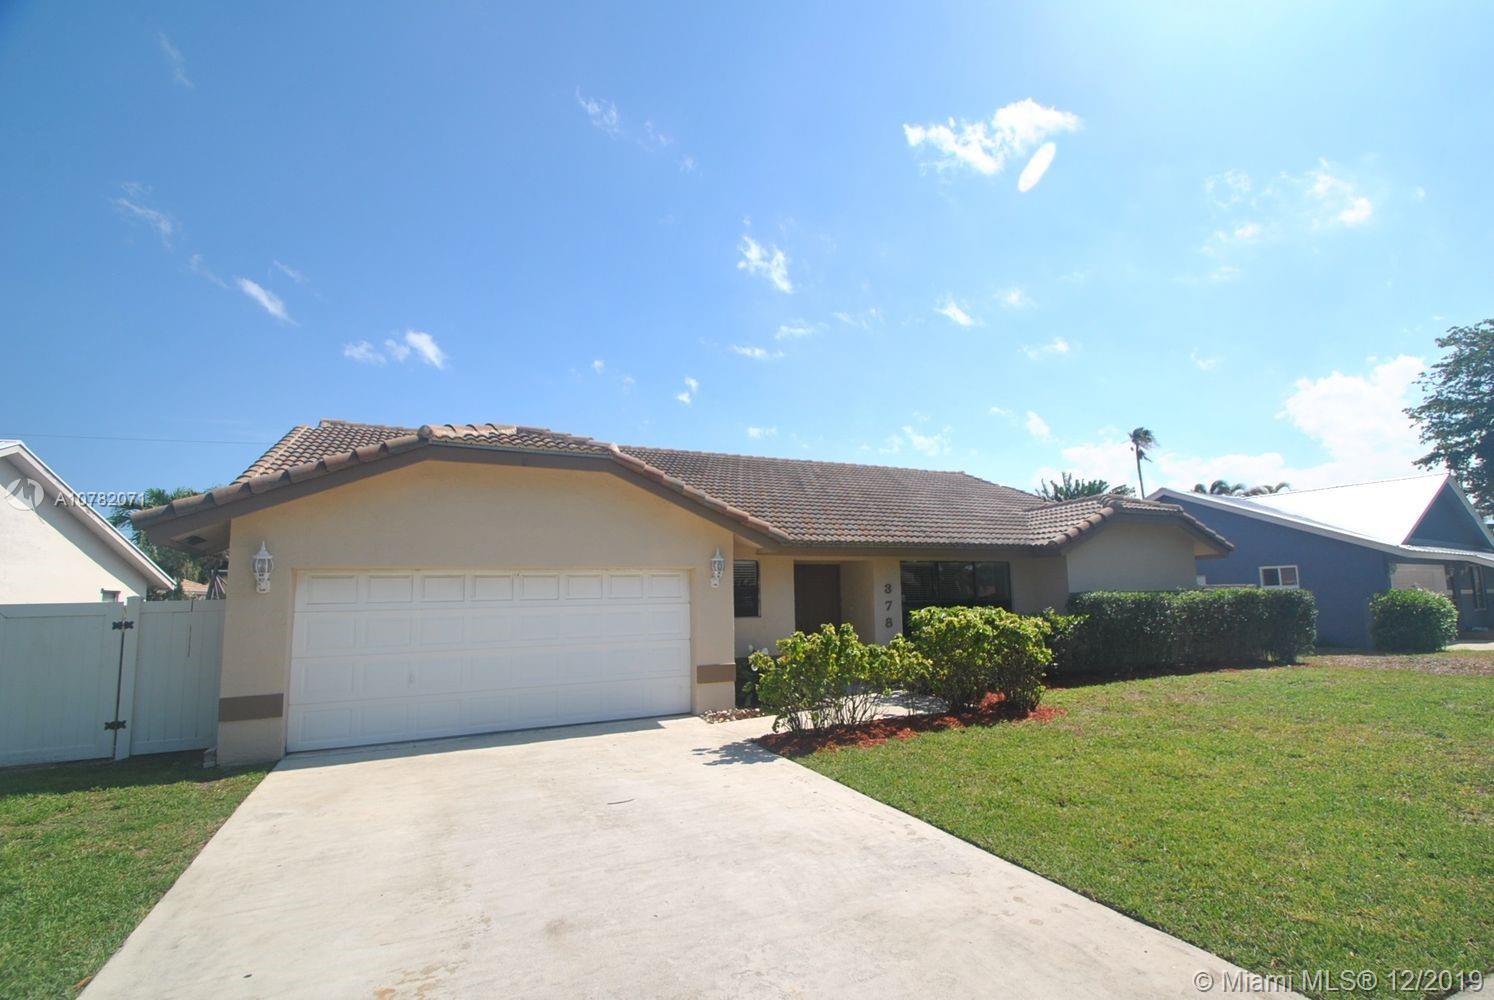 378 N Country Club Blvd, Boca Raton, FL 33487